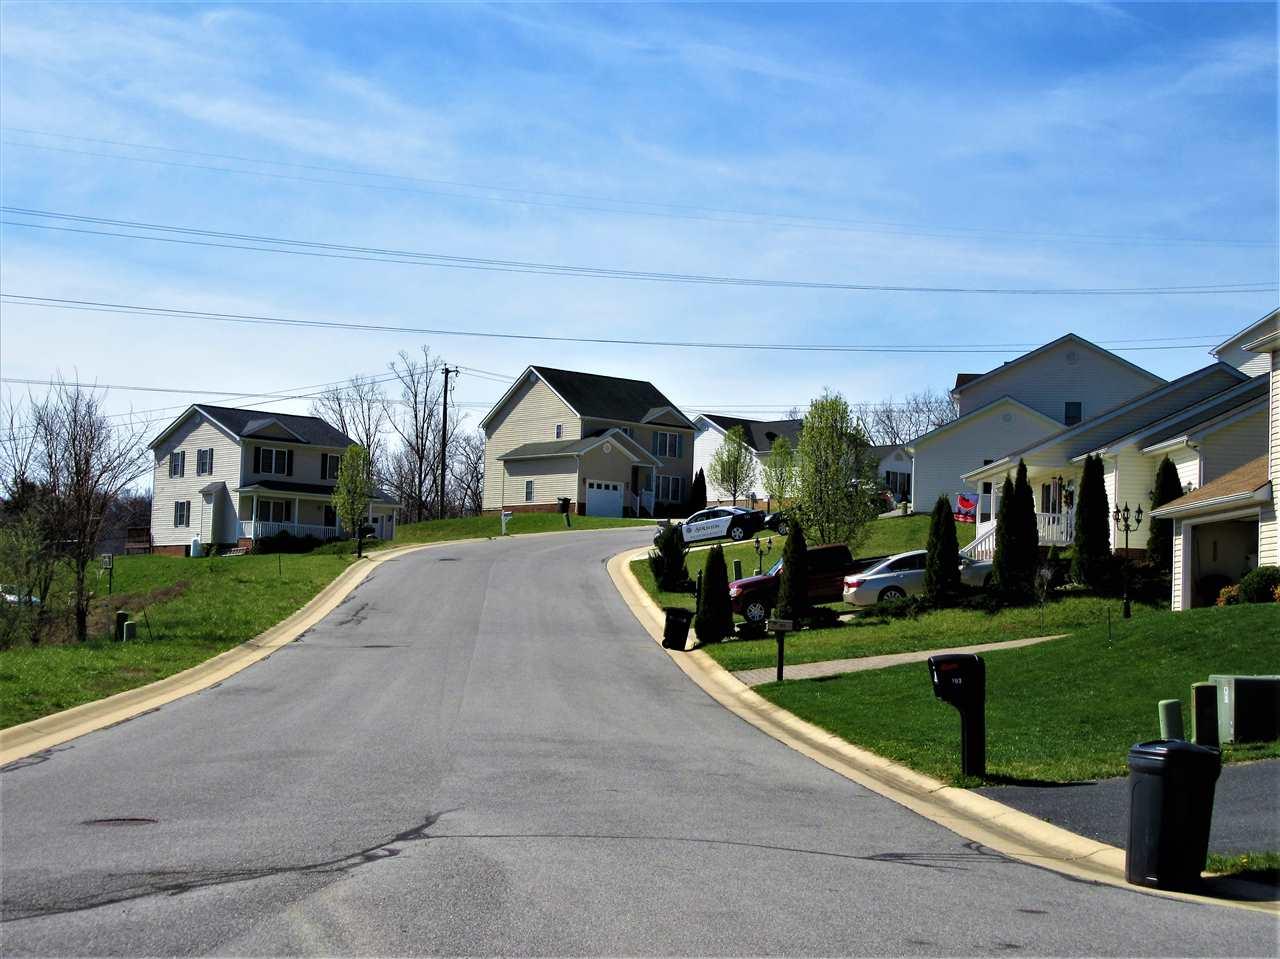 700 Paul St, Staunton, VA, 24401